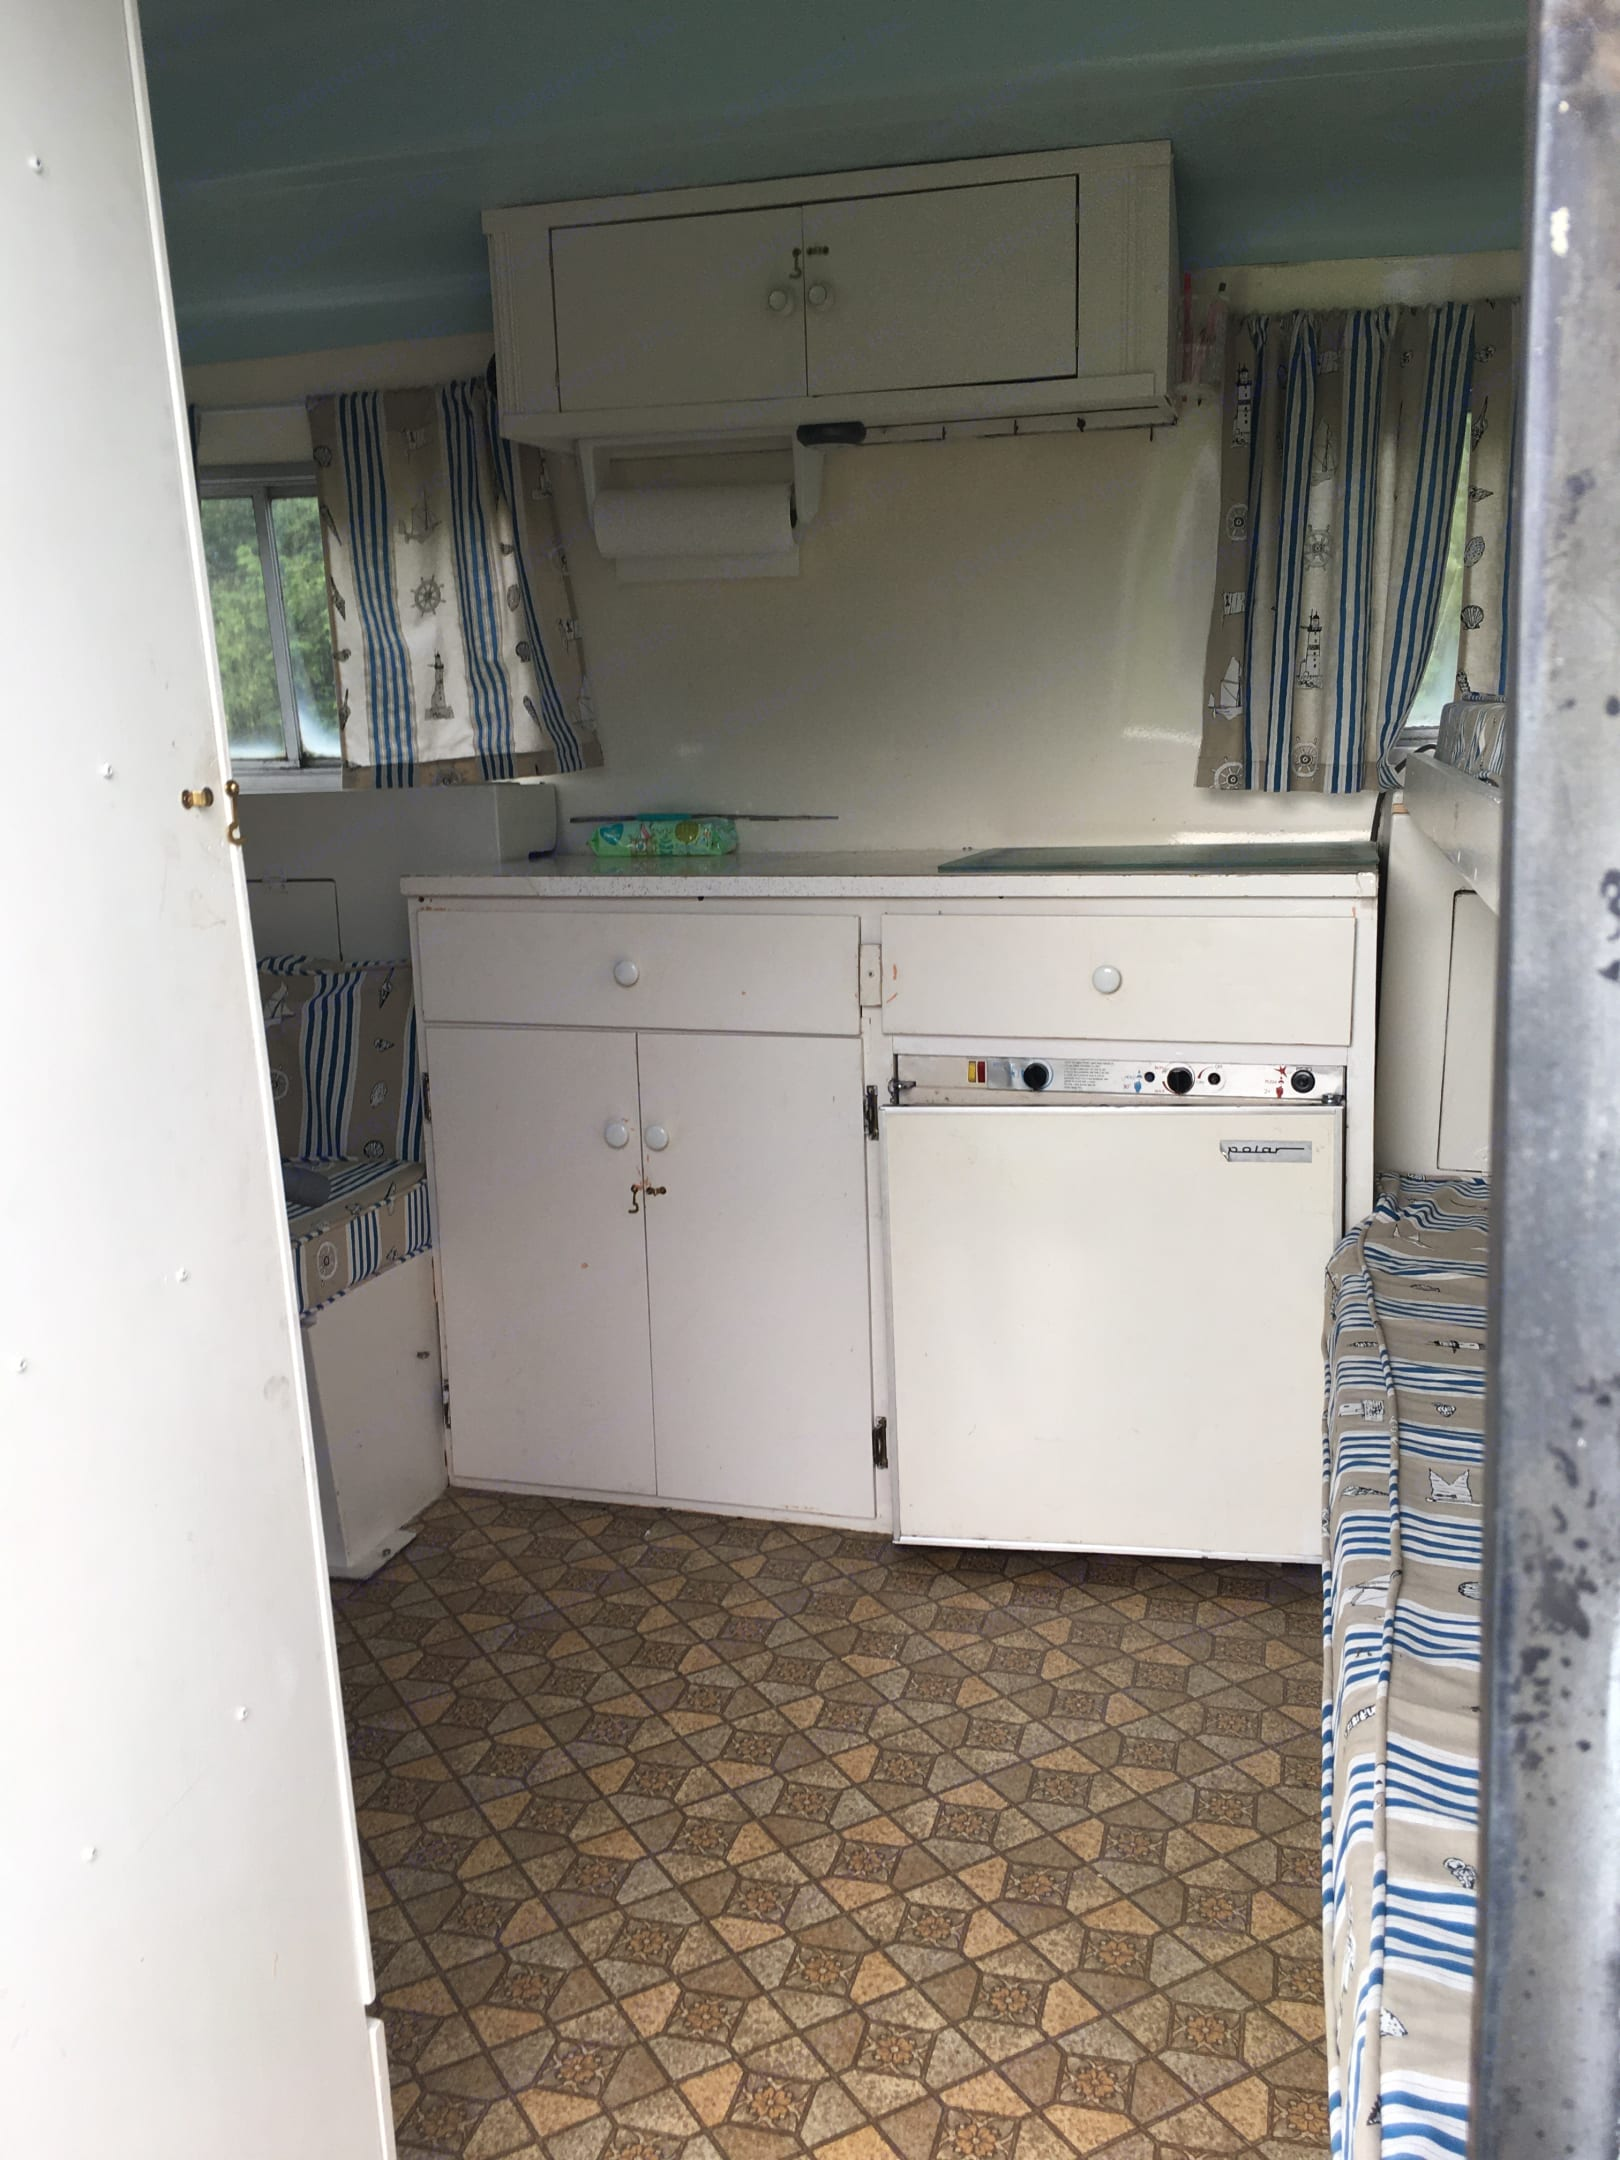 Electric fridge. Boler AerFlo 2140 1972